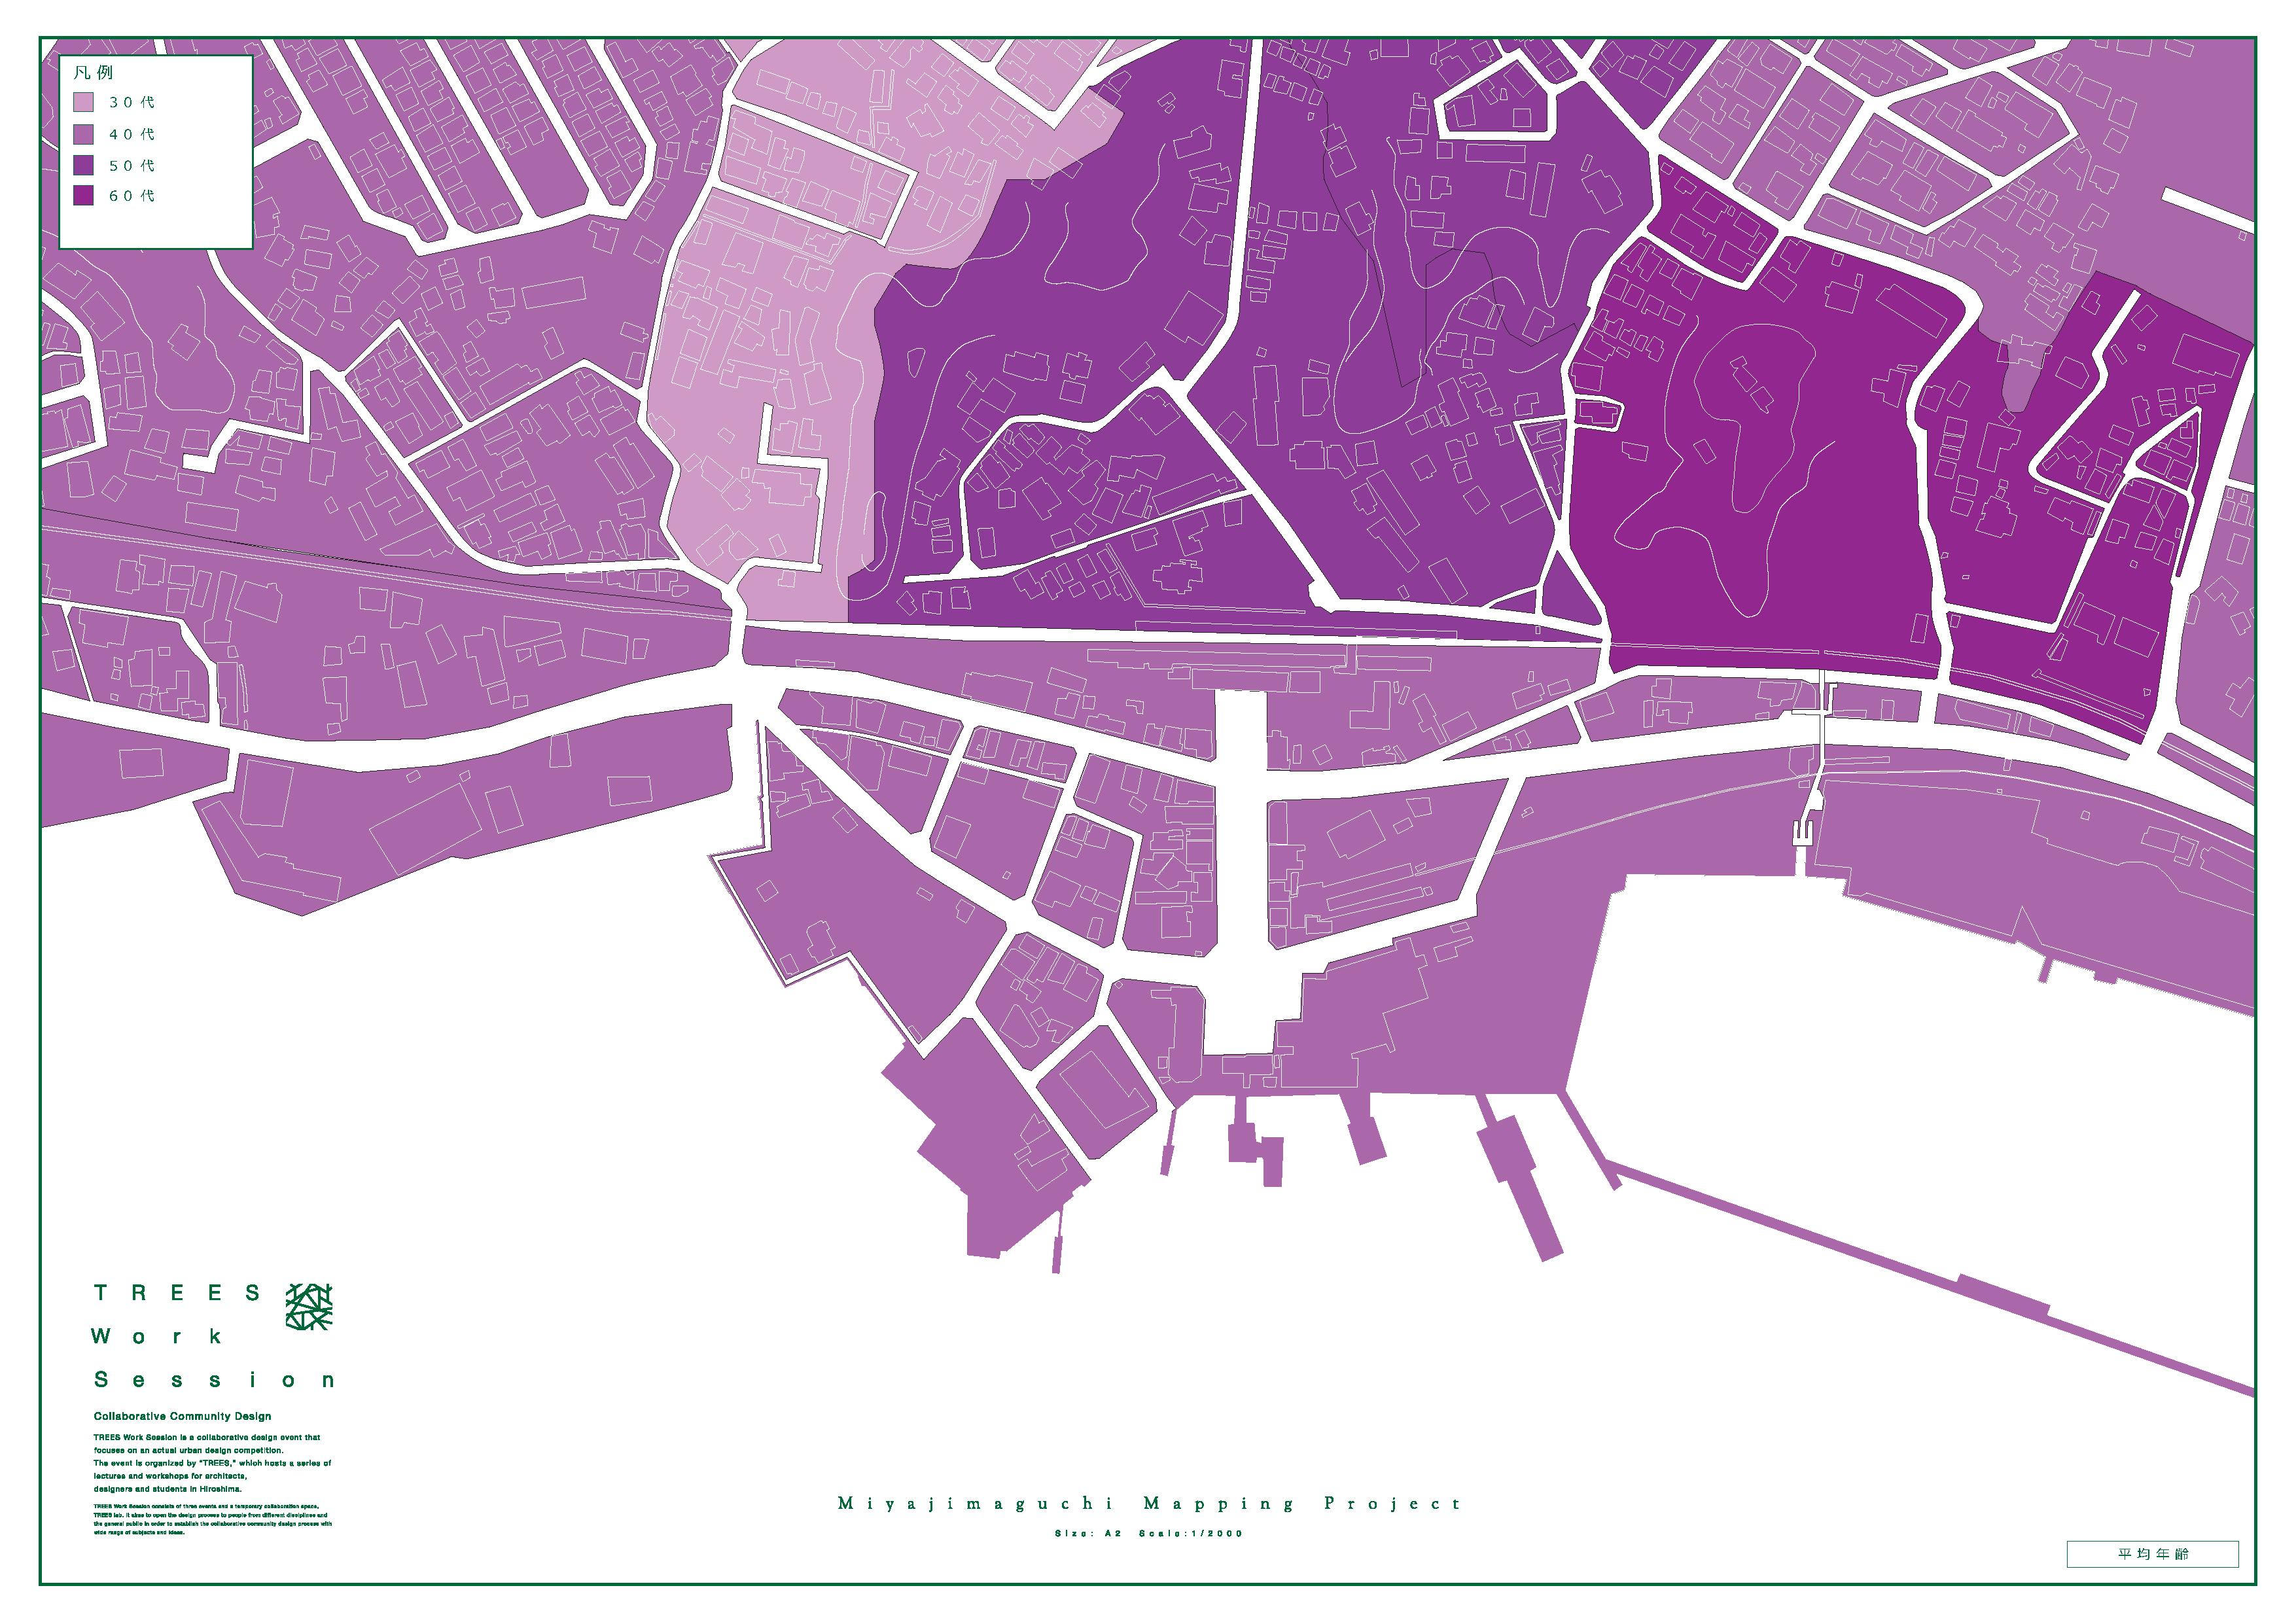 map_平均年齢.png